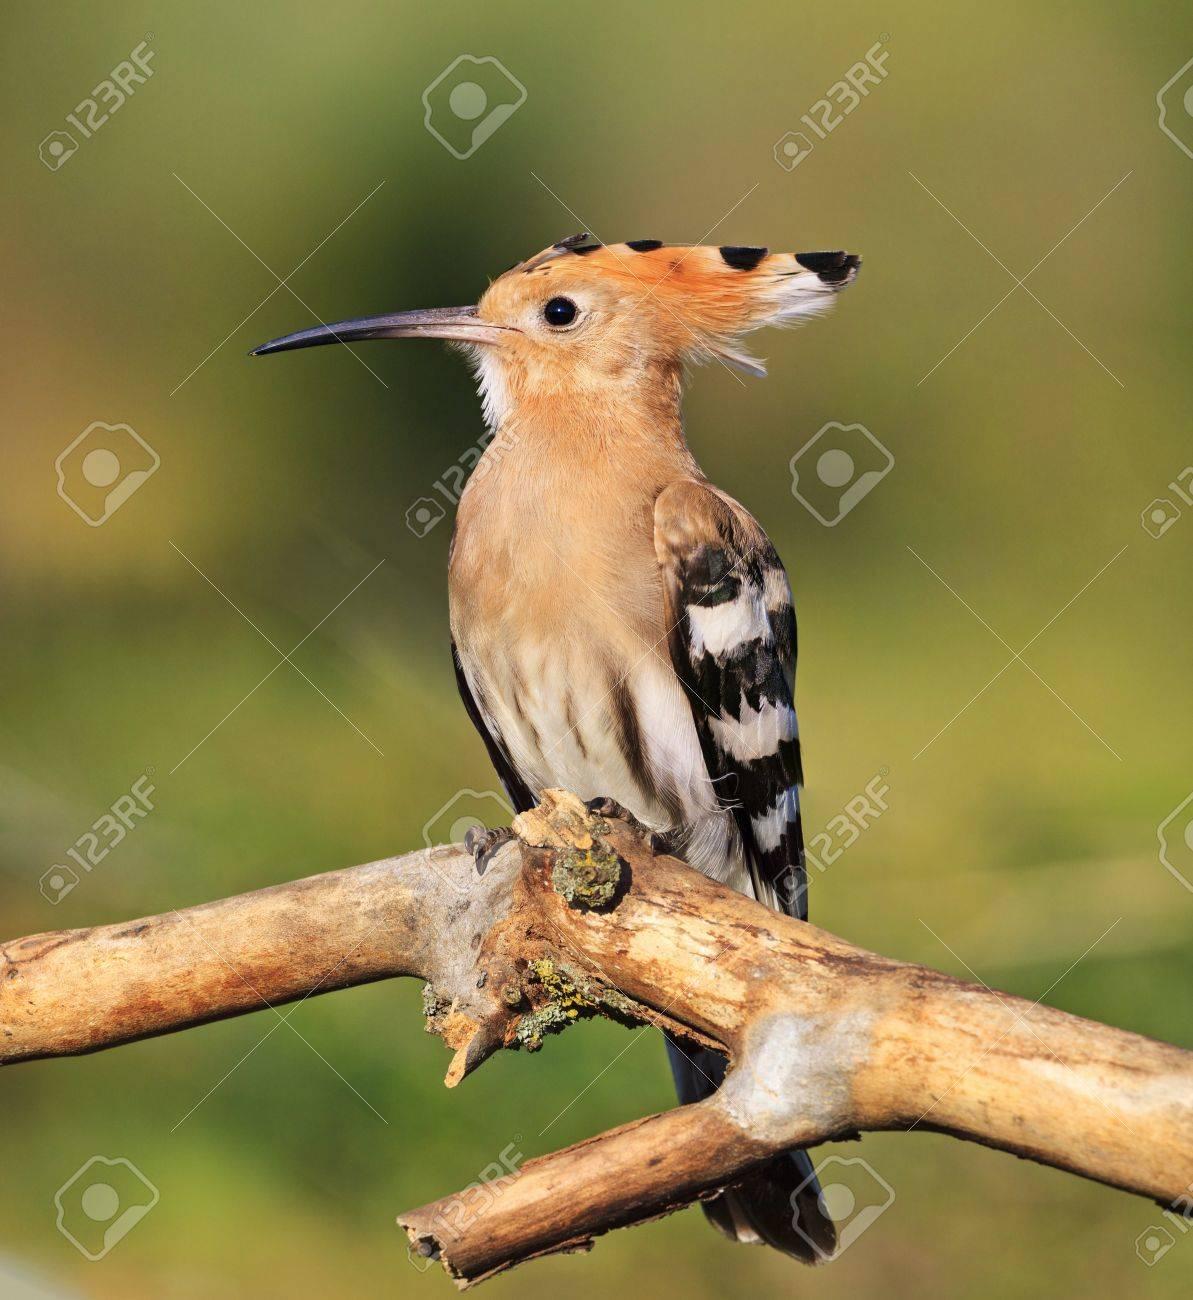 Royal Hoopoe Bird Is A Symbol Of Love And Gratitudeexclusive